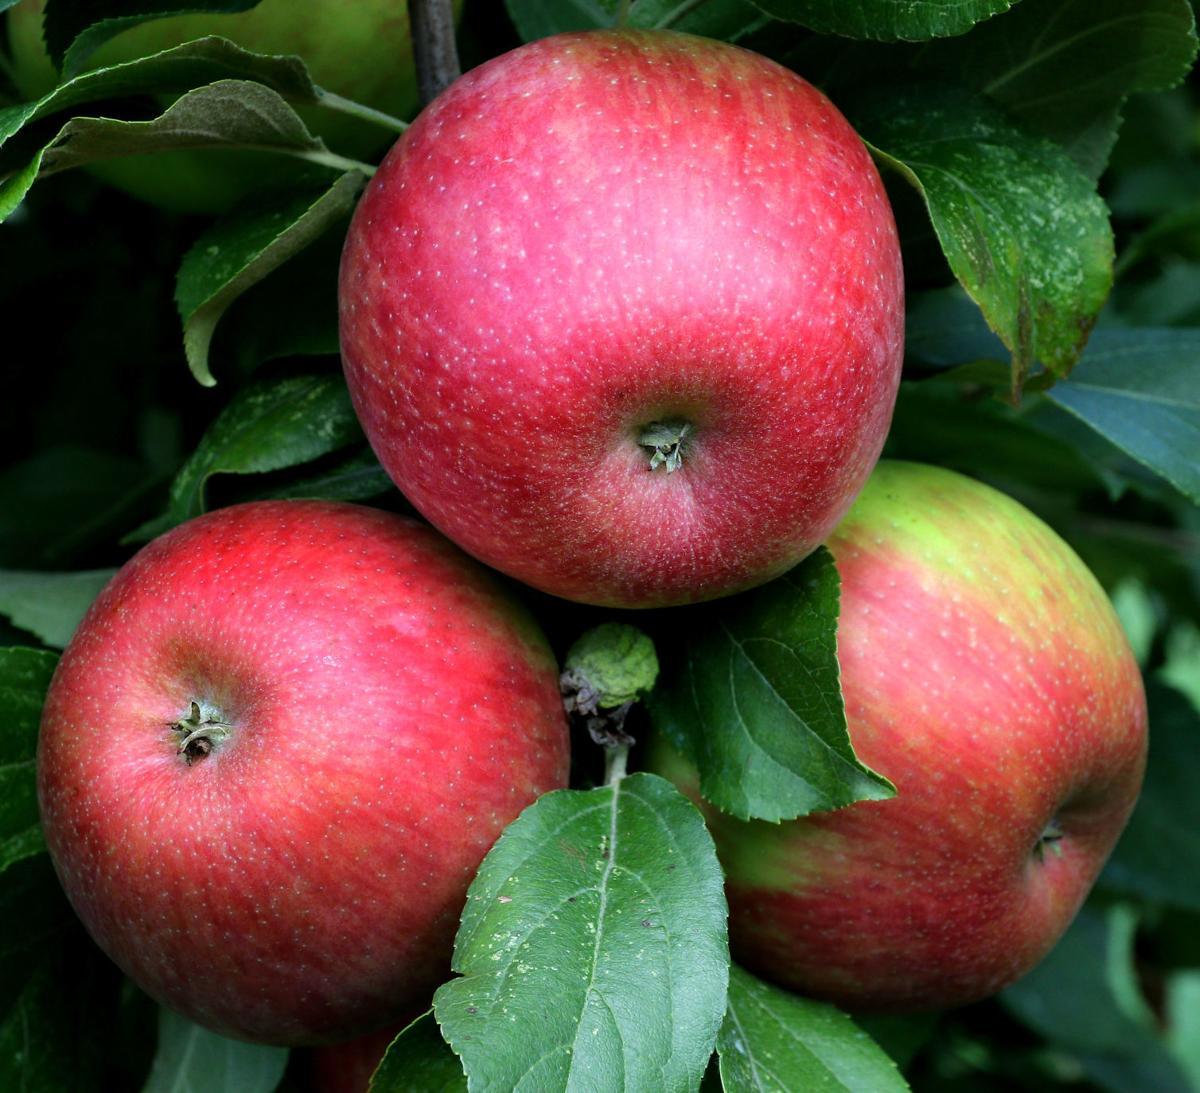 090419_dr_apple_11a